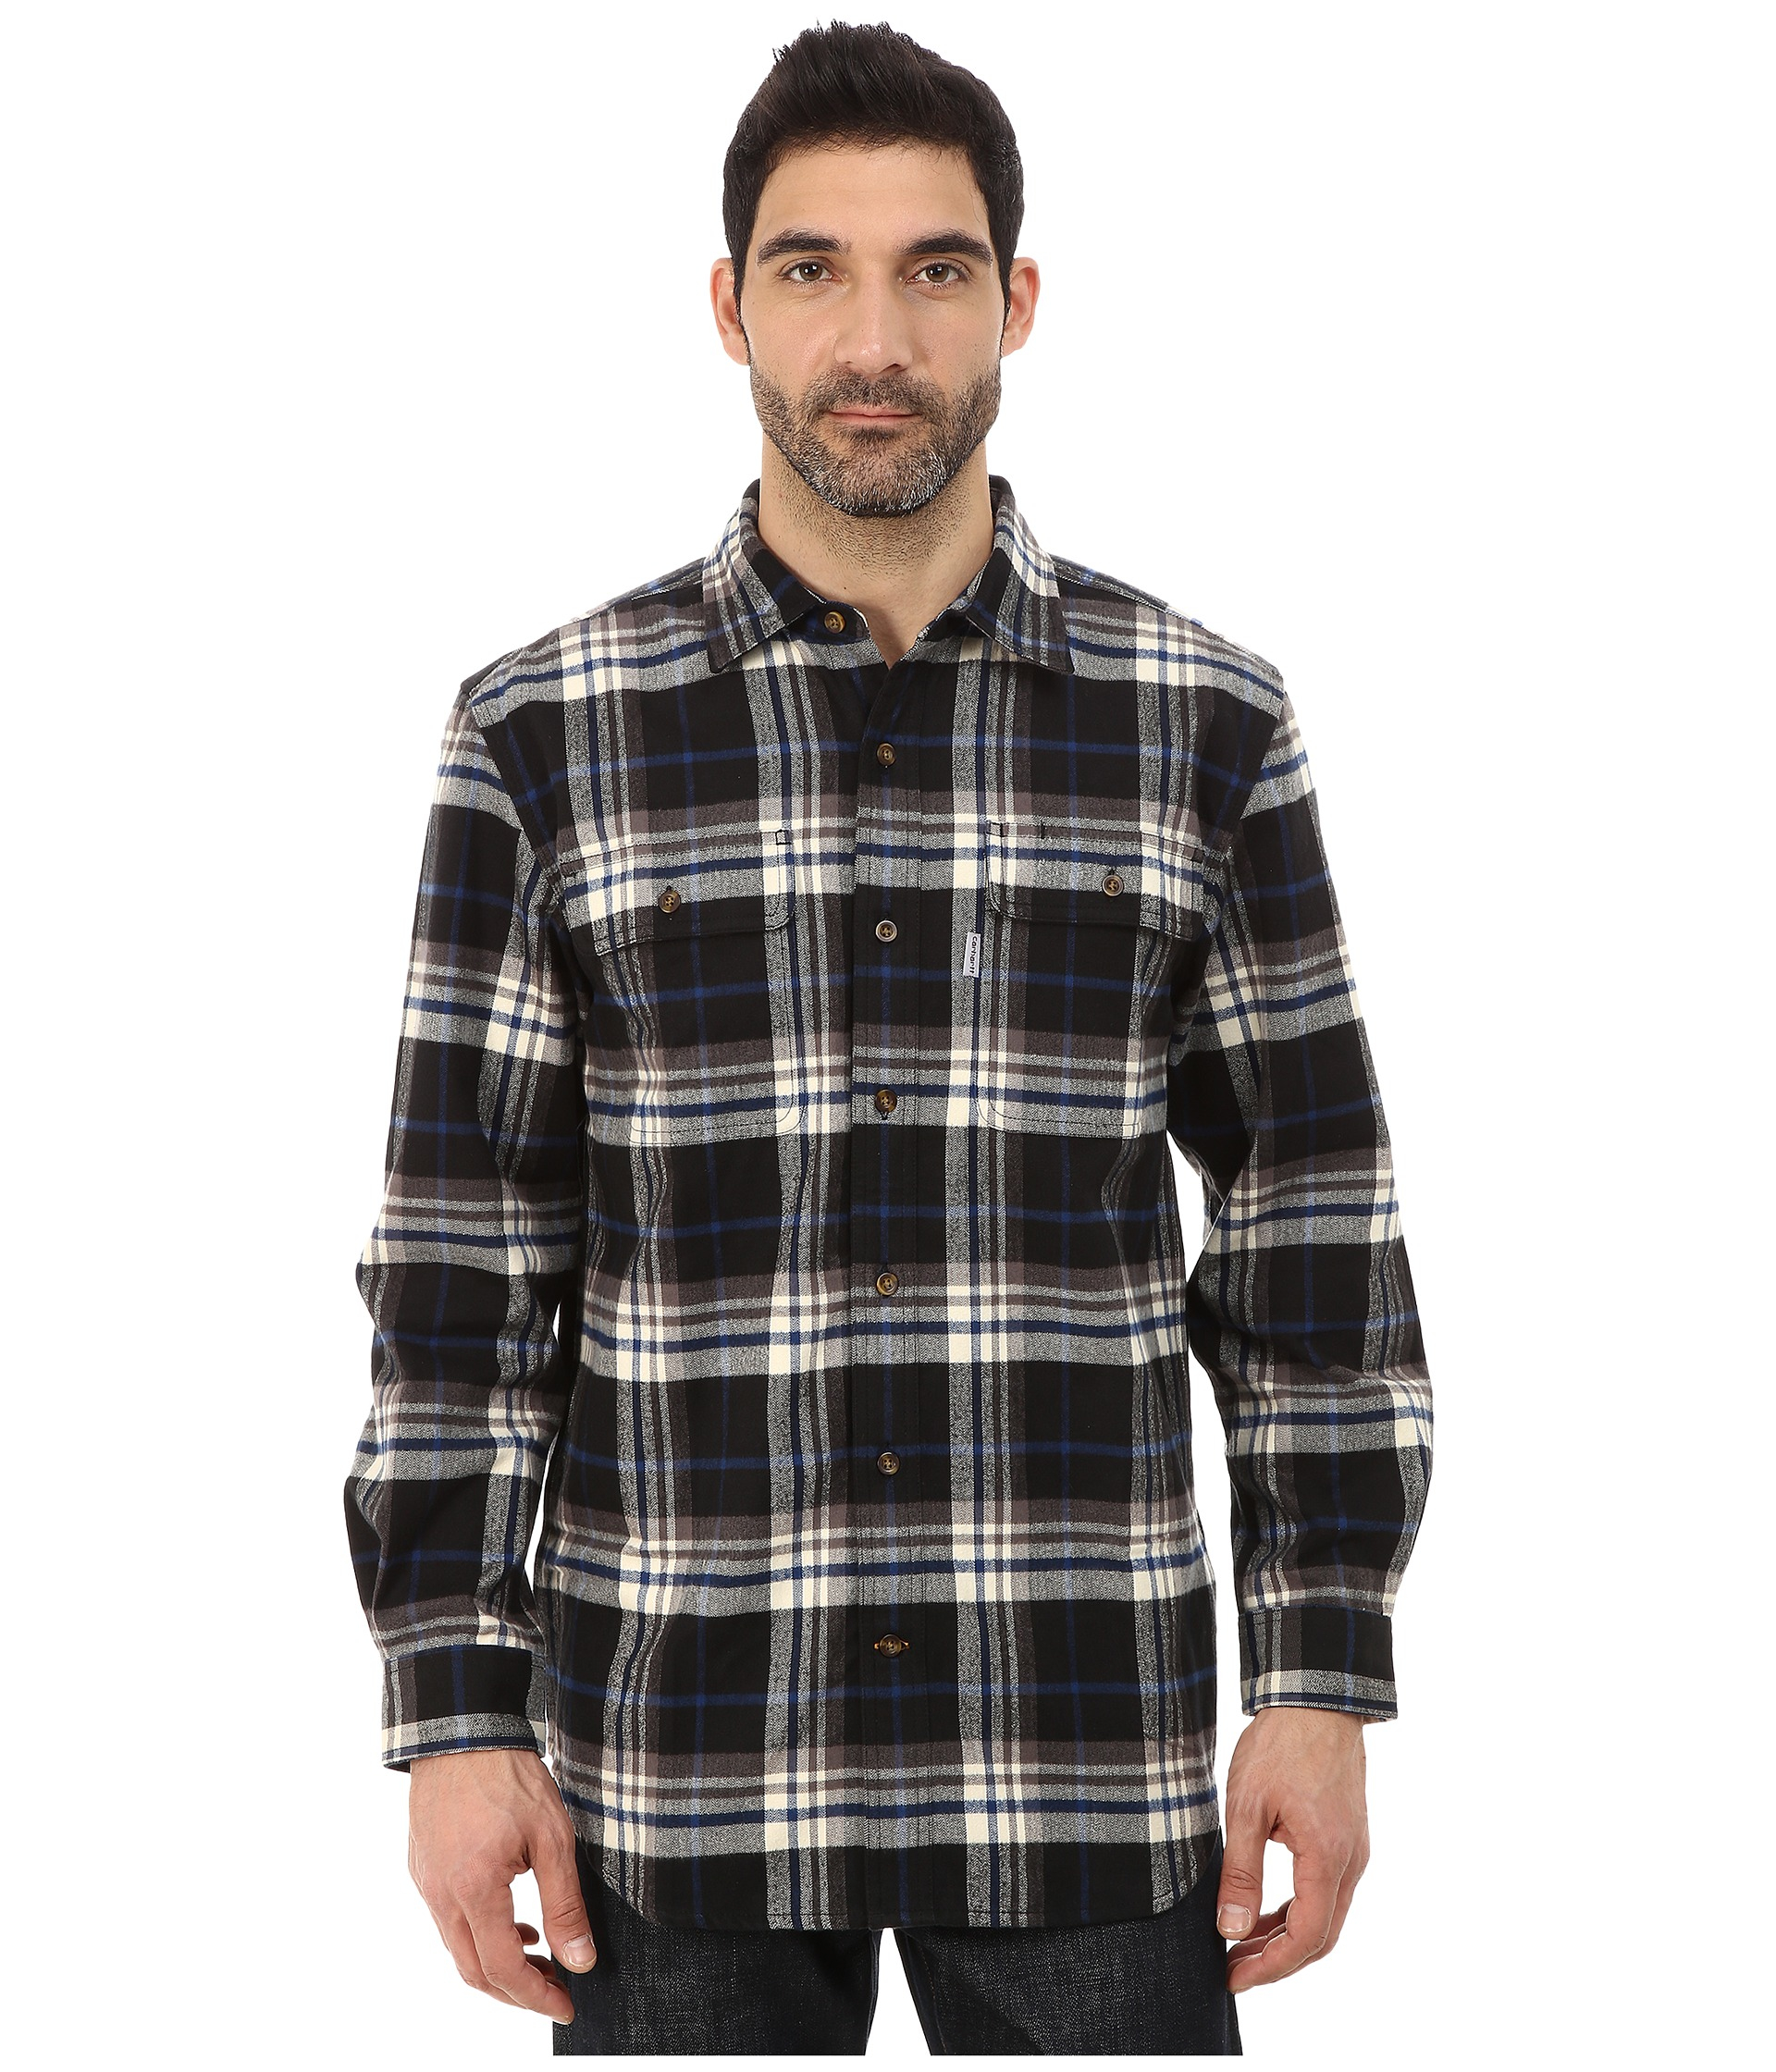 Carhartt hubbard plaid shirt in black for men lyst for Black plaid shirt mens